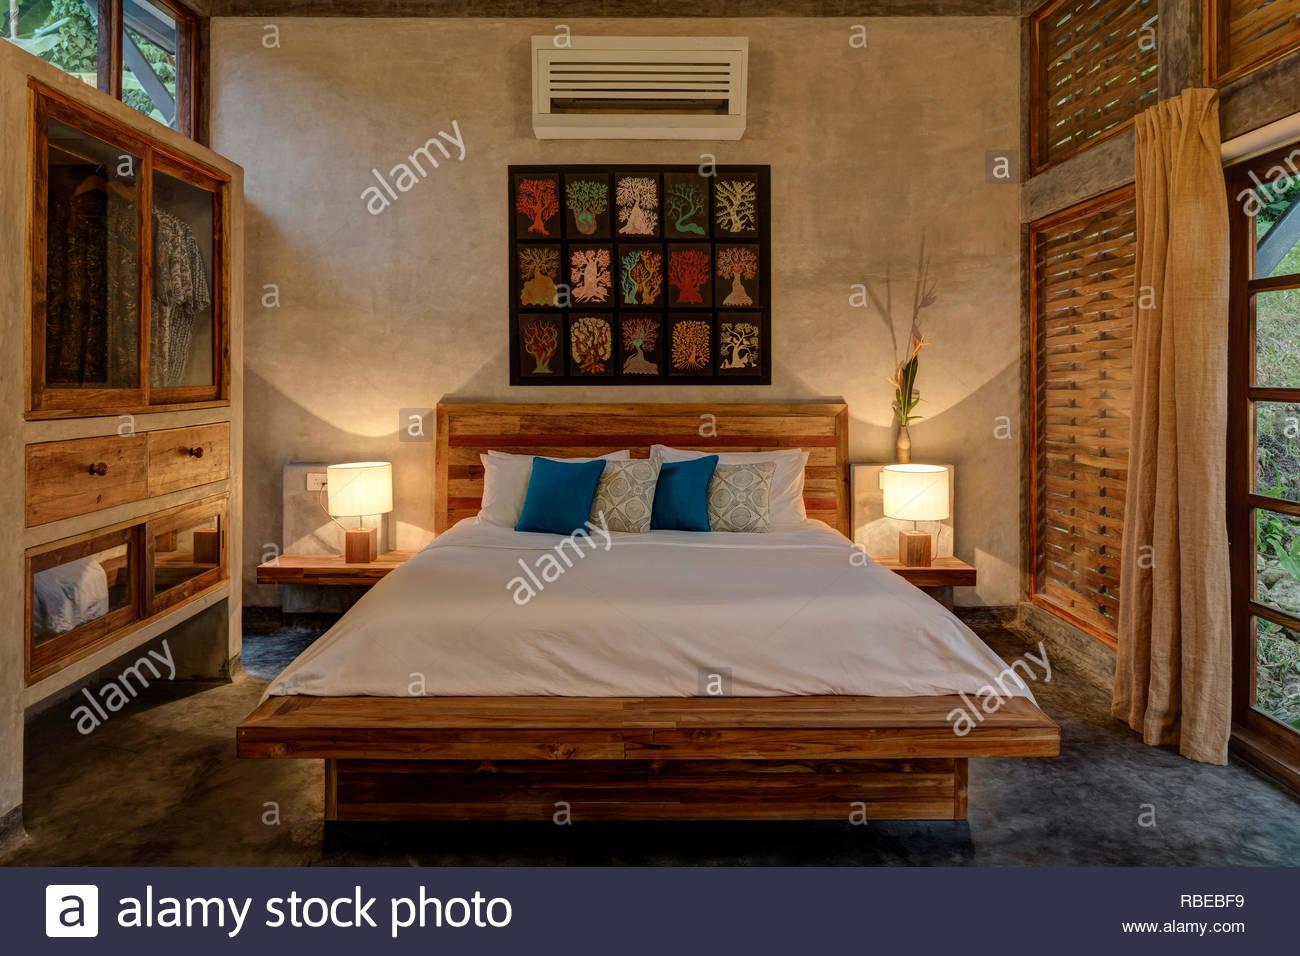 Ajith Stock Photos & Ajith Stock Images - Alamy